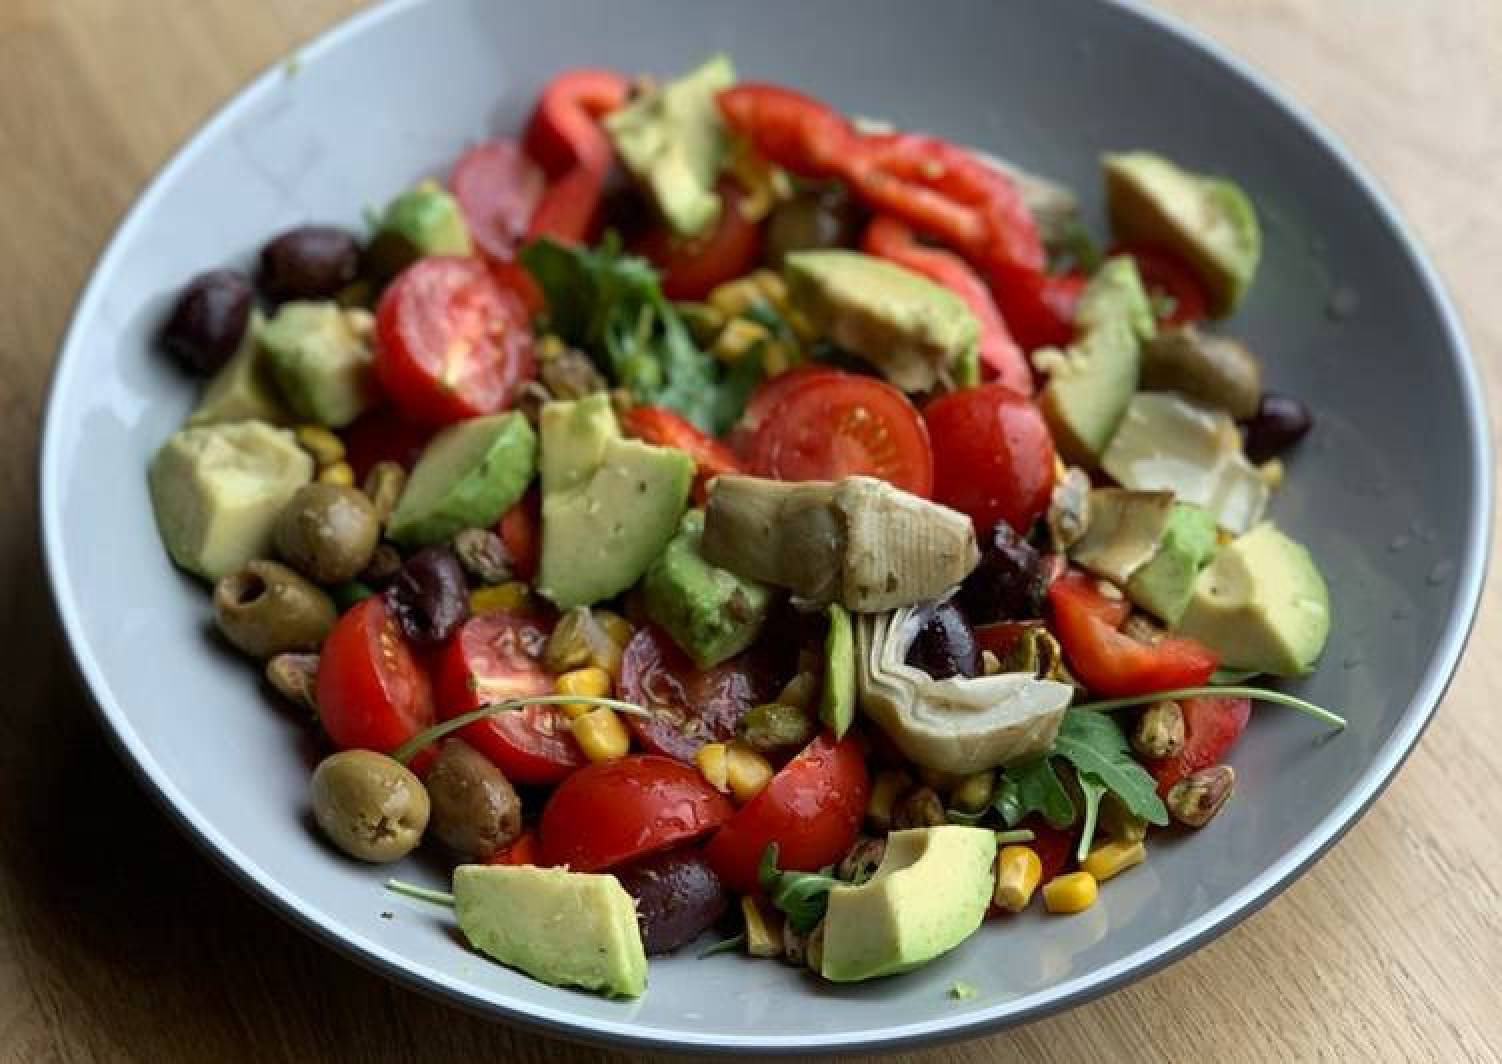 Avocado and rocket salad